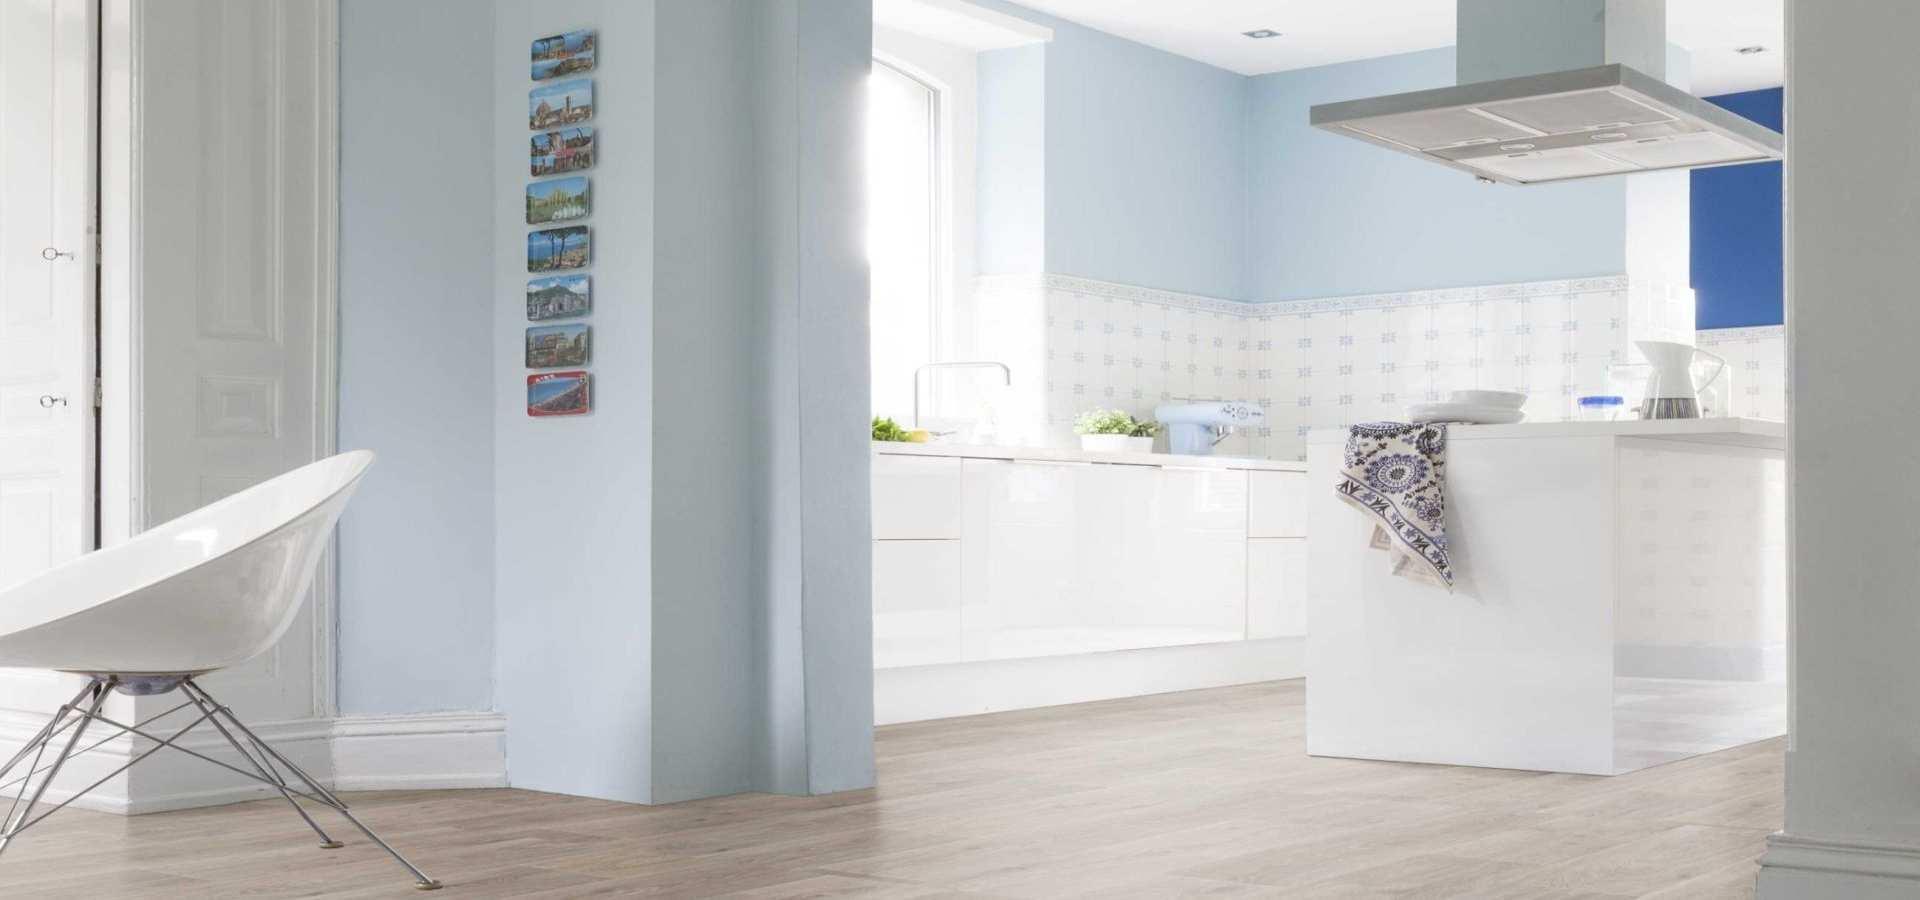 Bild Küche CV Belag Holzoptik Landhausdiele hell